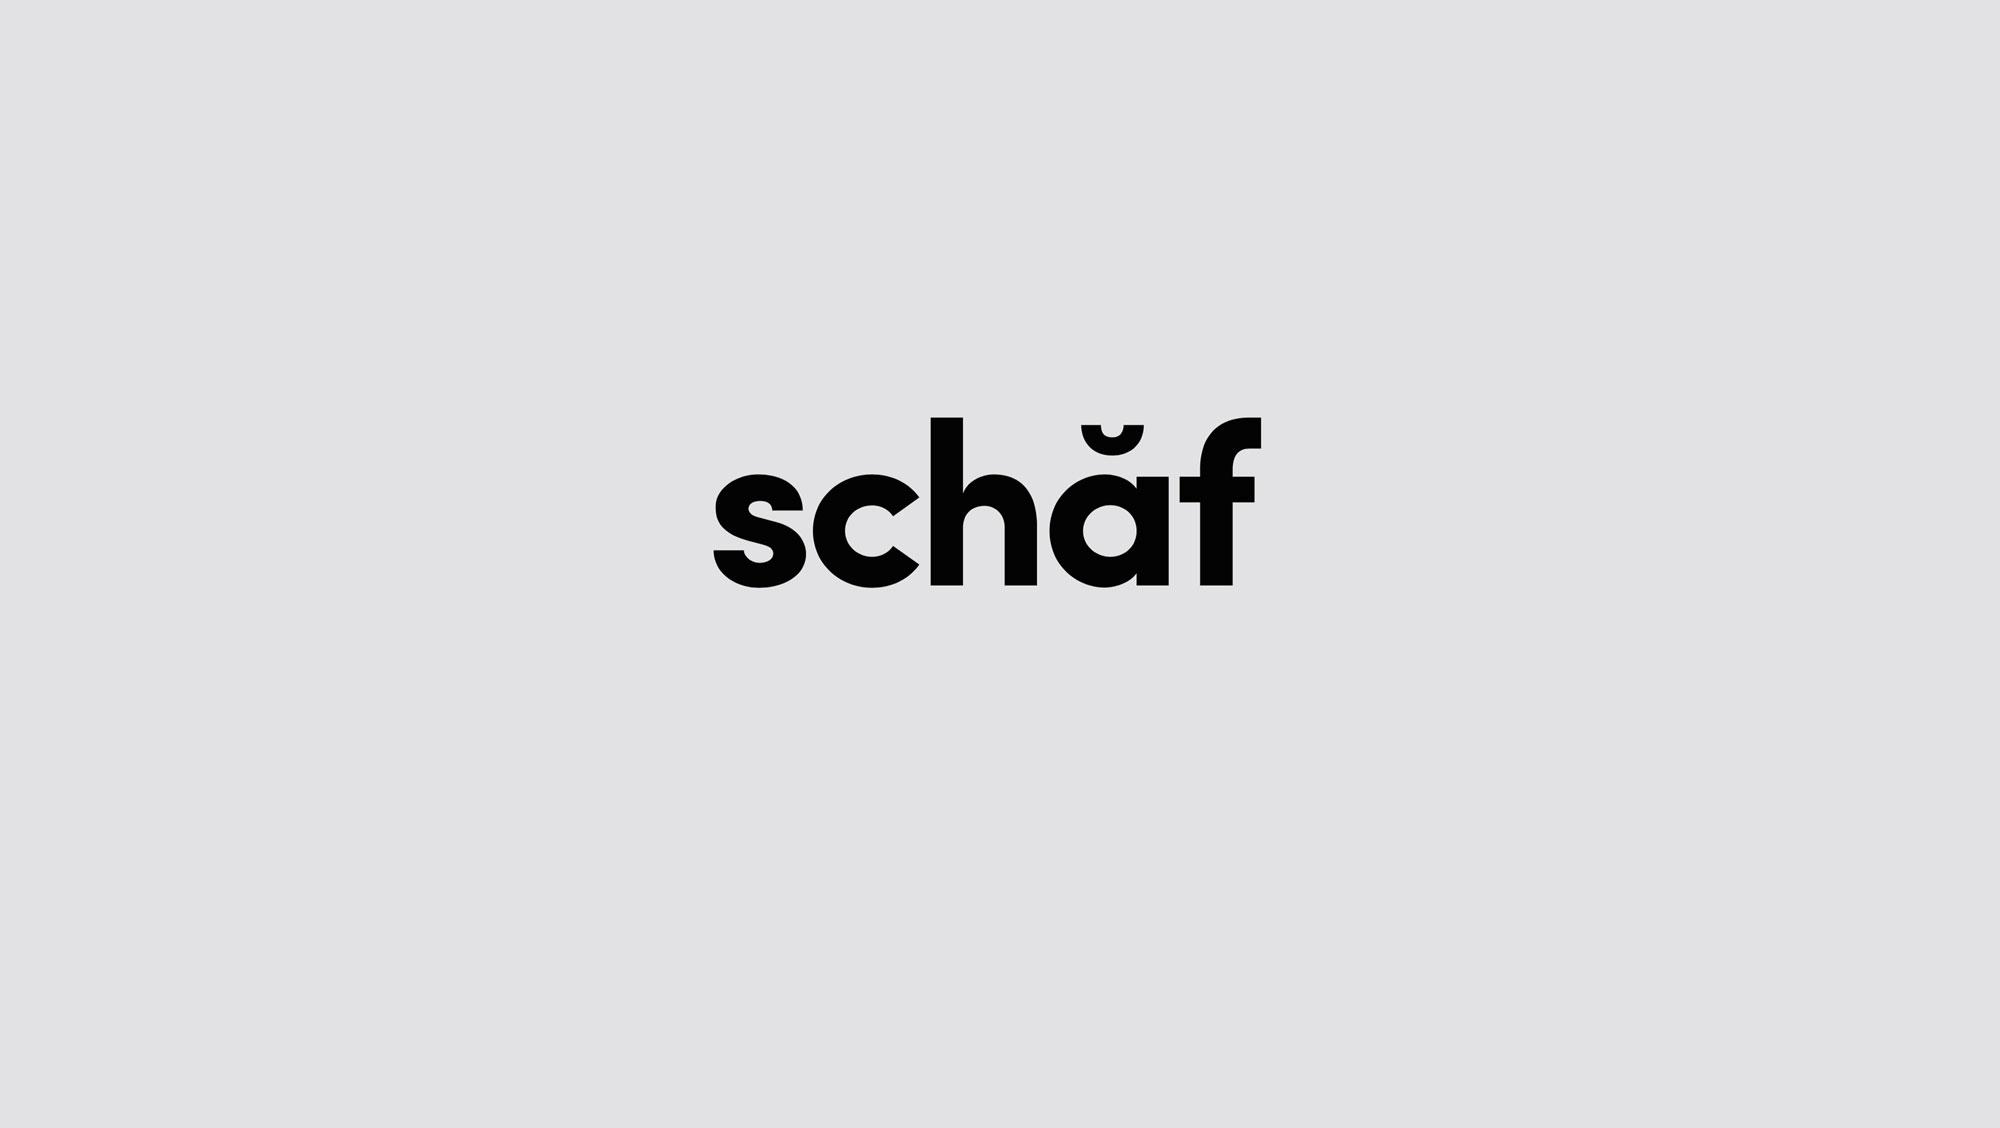 Fuhr_Studio_Design_og_branding_bureau_Schaf_Visuel_Identitet_055.jpg